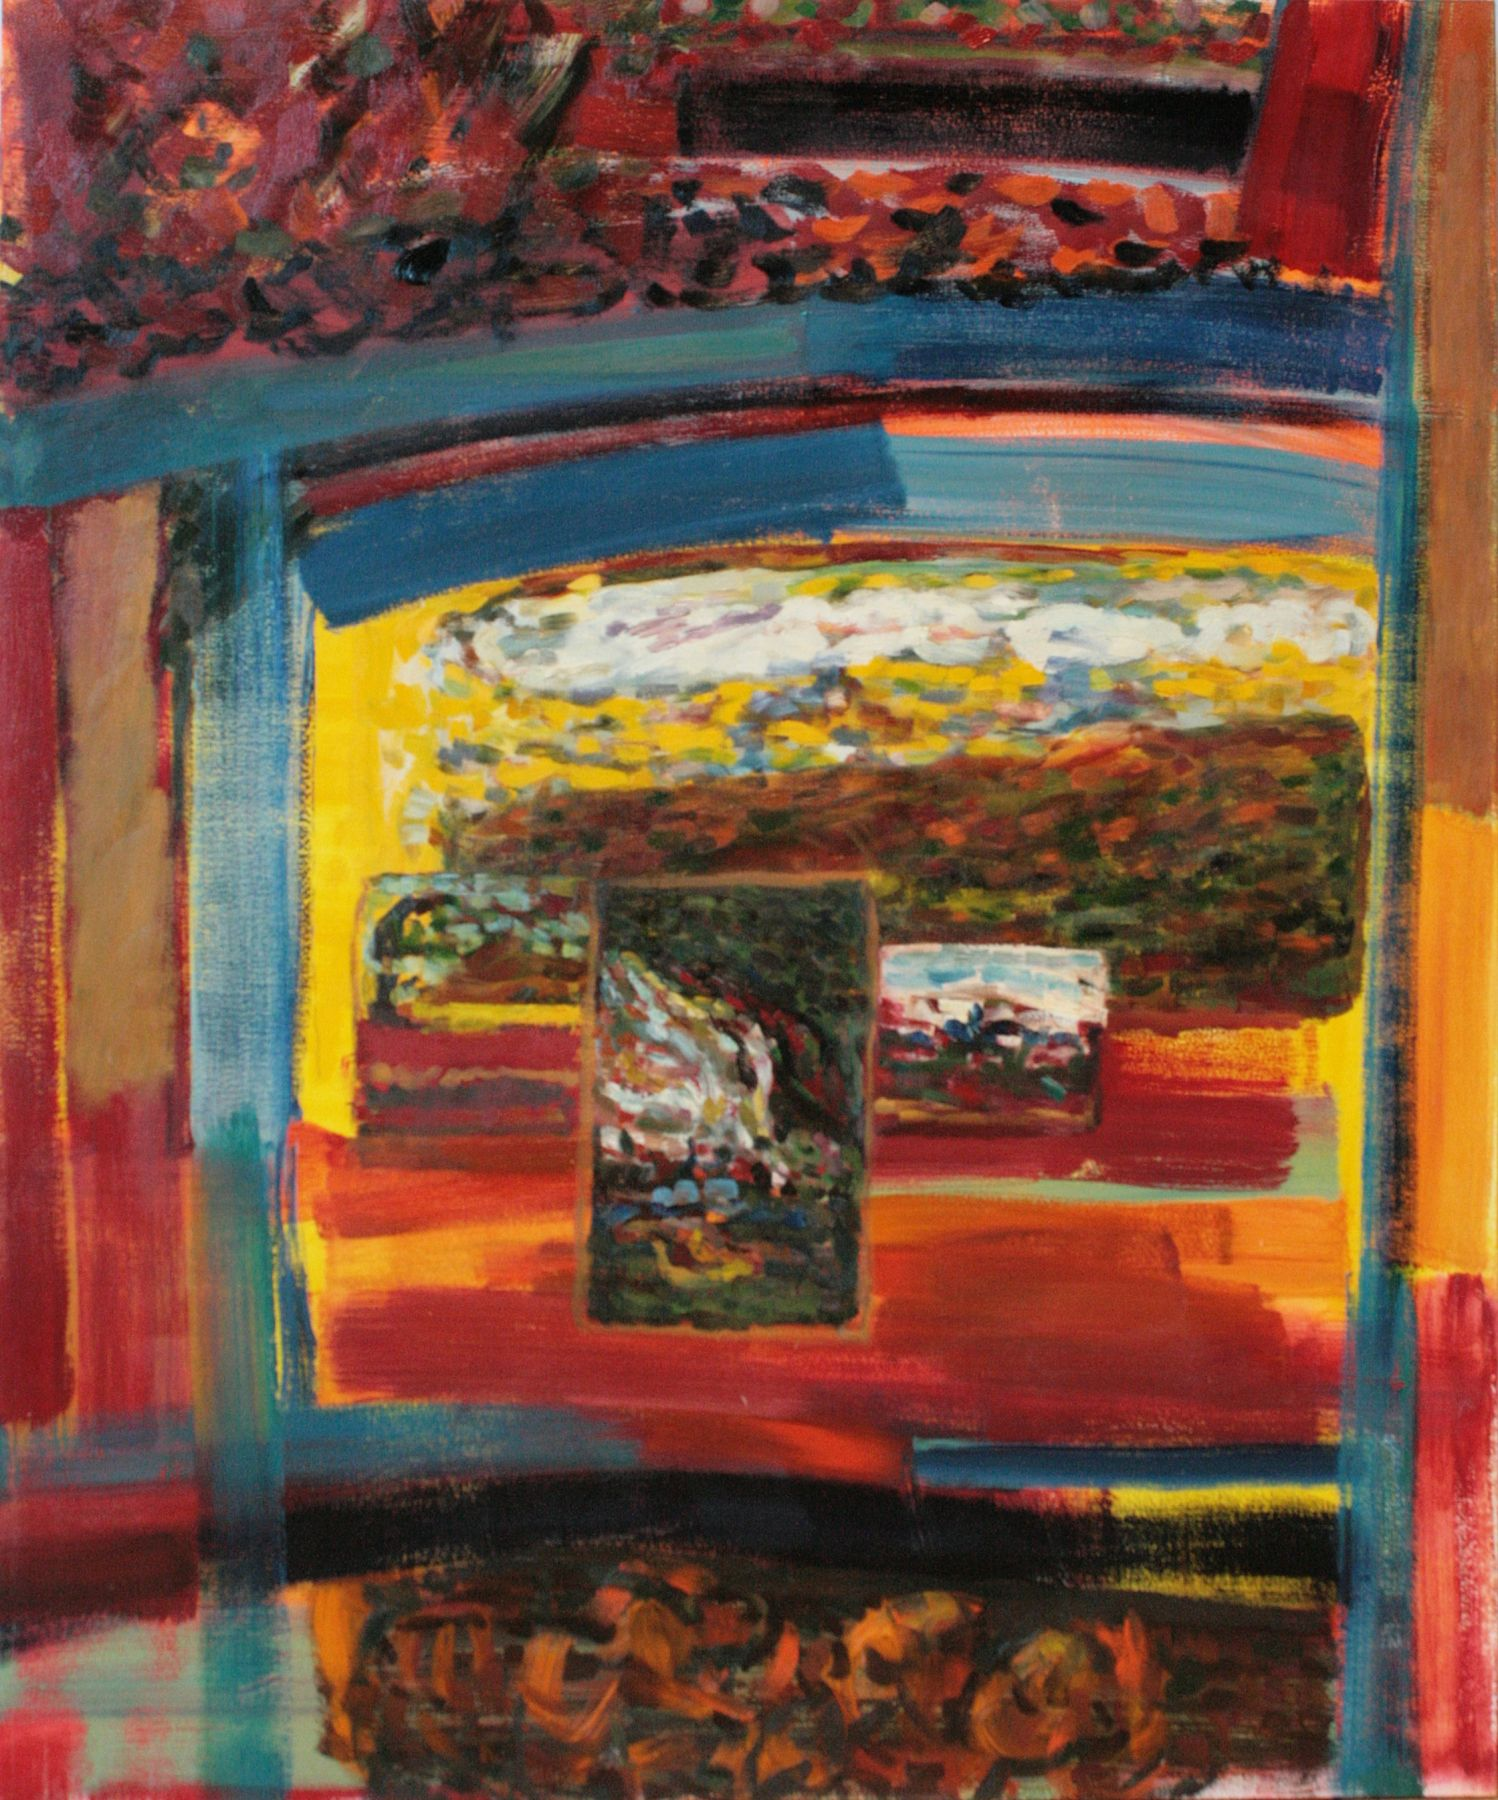 A Quiet Word, Gina Rorai, 2007